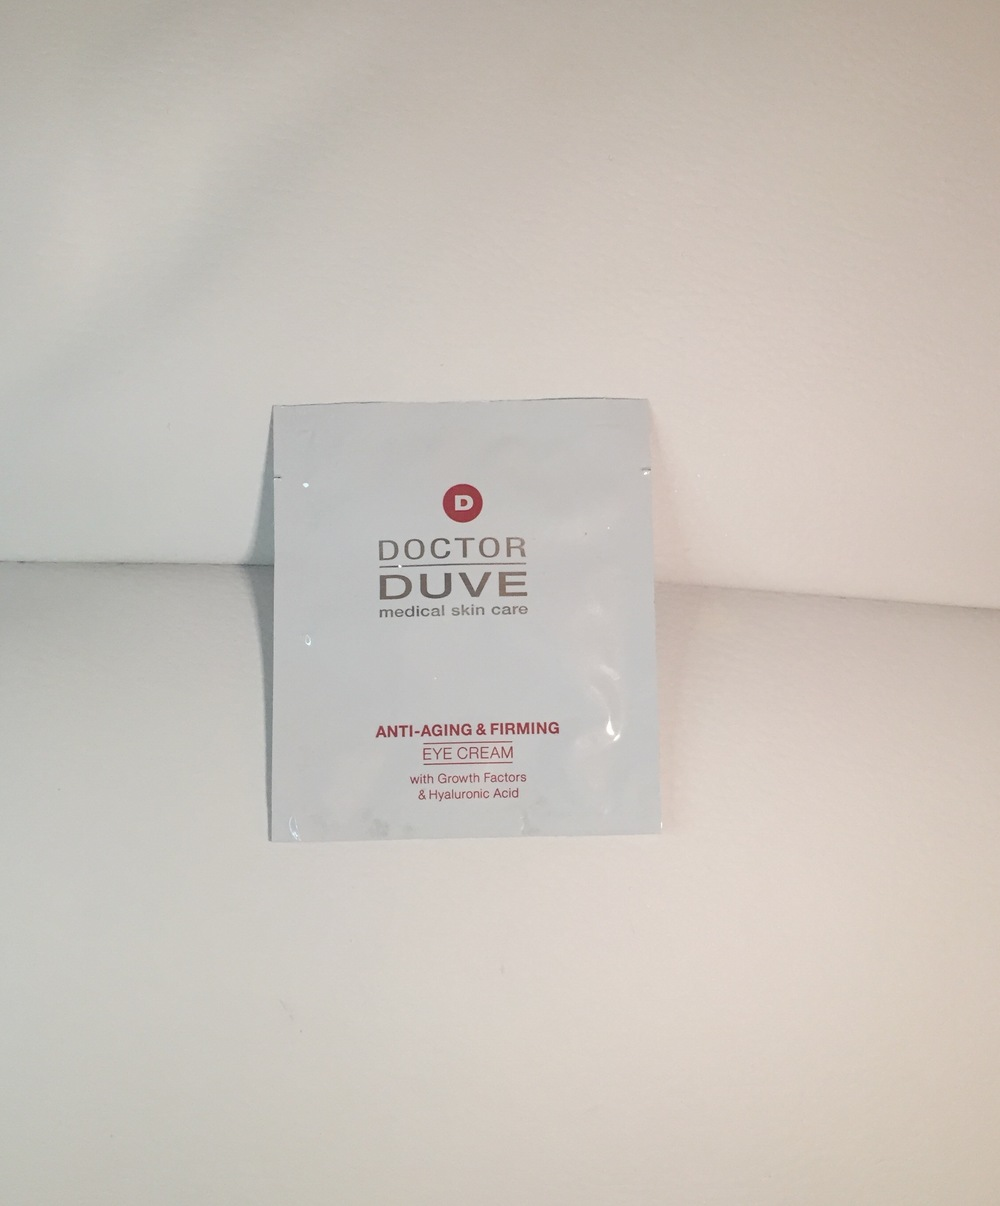 Doctor Duve Anti-Aging & Firming Eye Cream